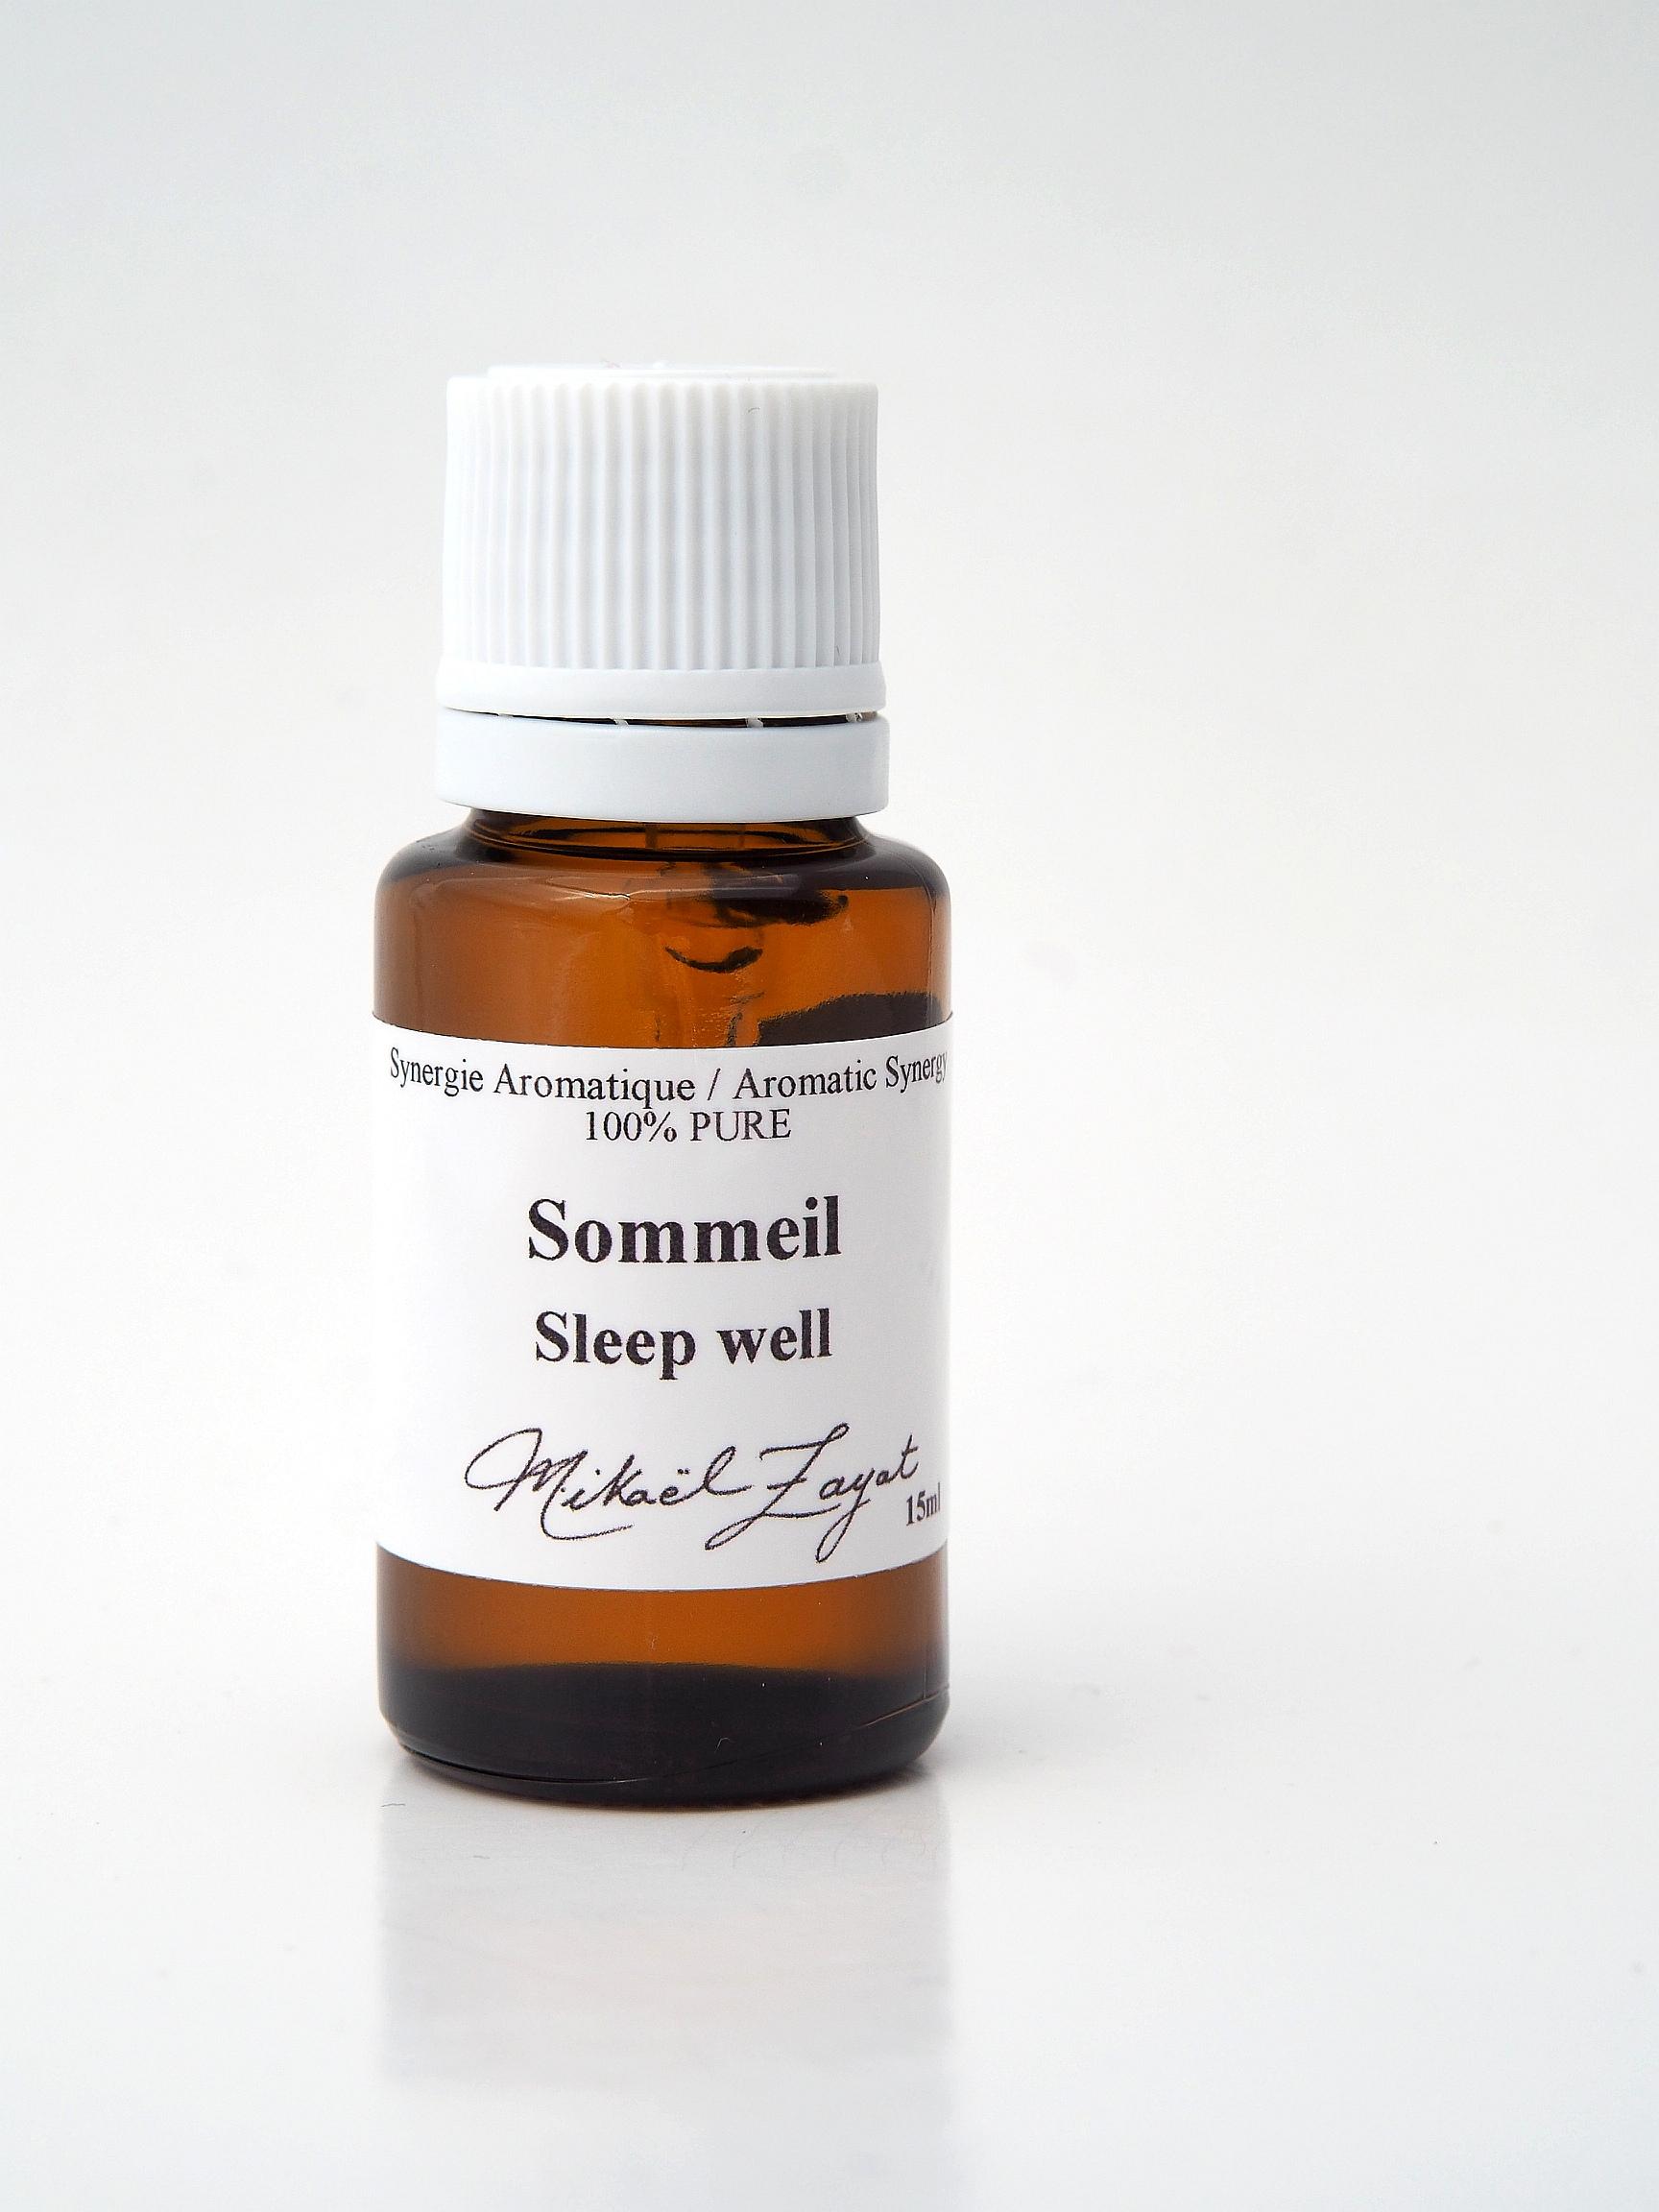 Sommeil Sleep well